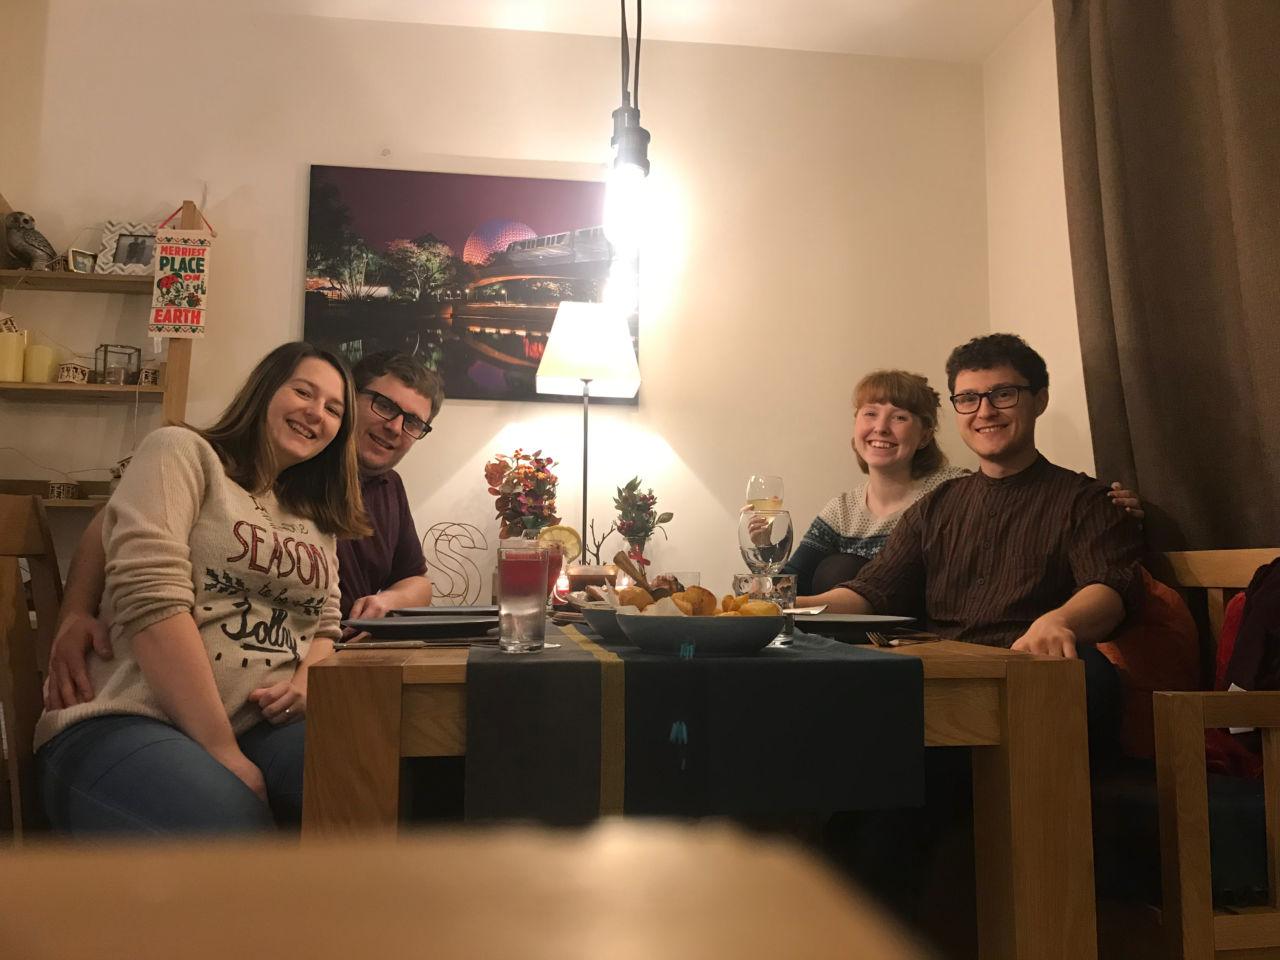 Italian Christmas dinner - porchetta